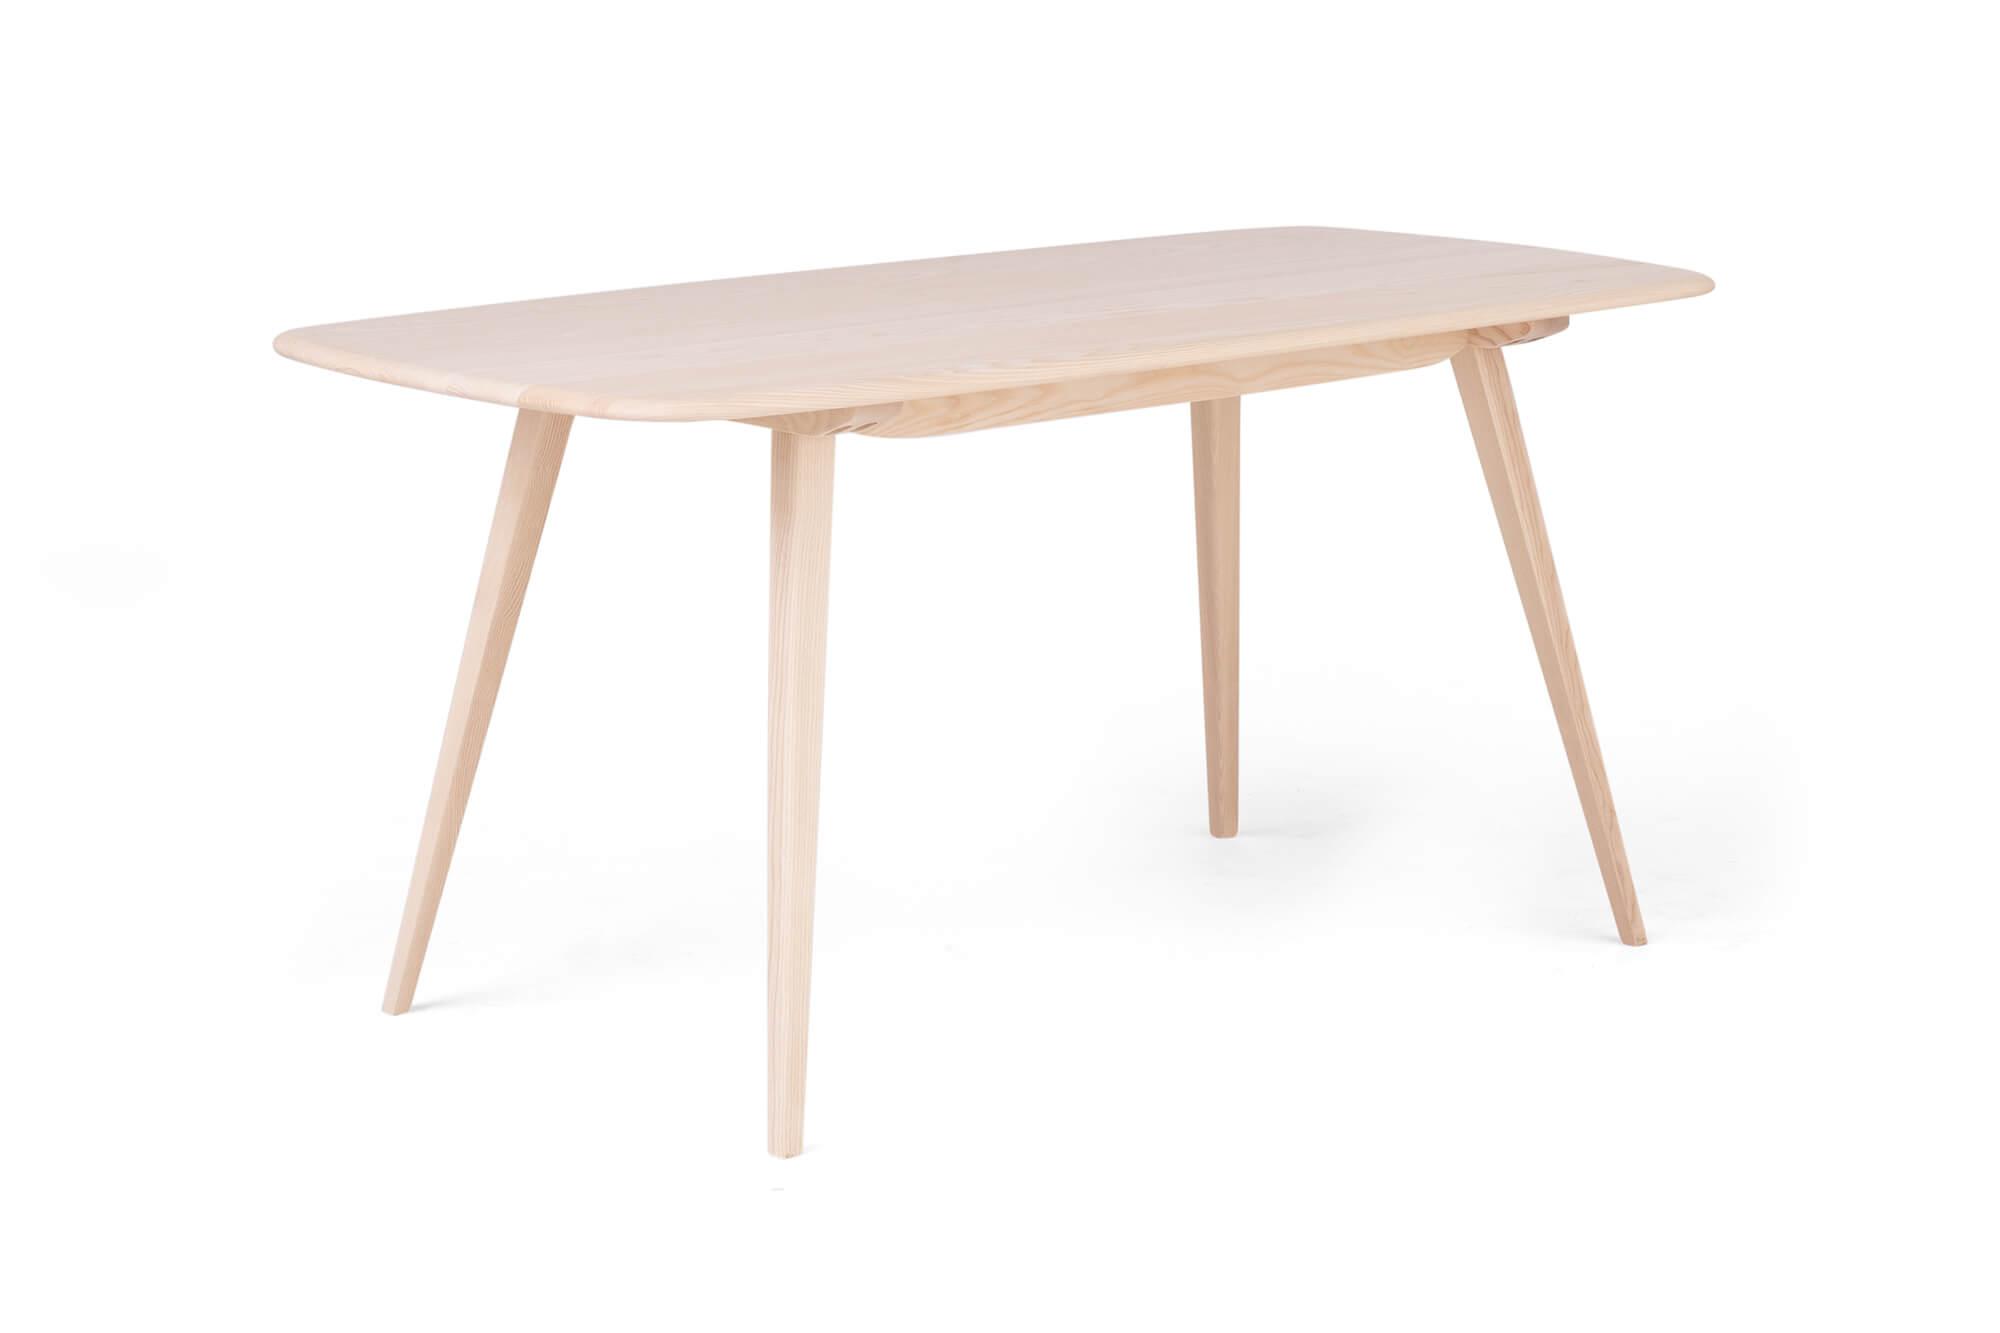 Originals Plank Table